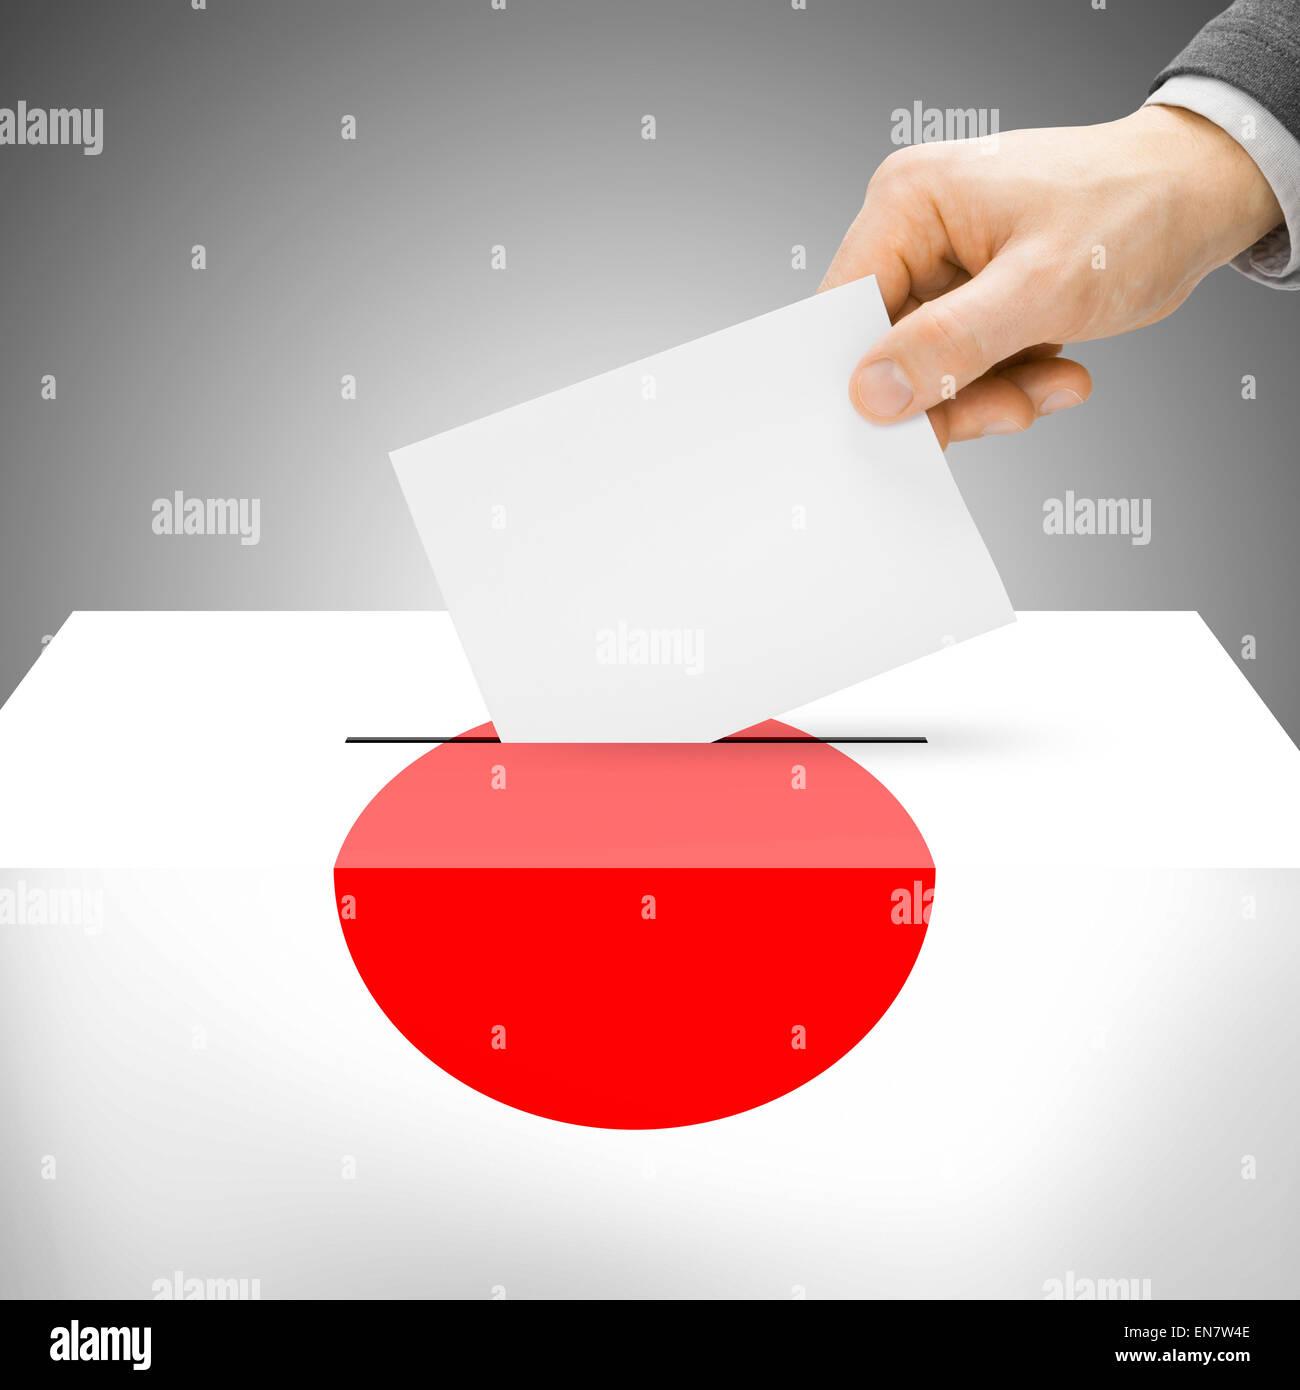 Ballot box painted into national flag colors - Japan Stock Photo